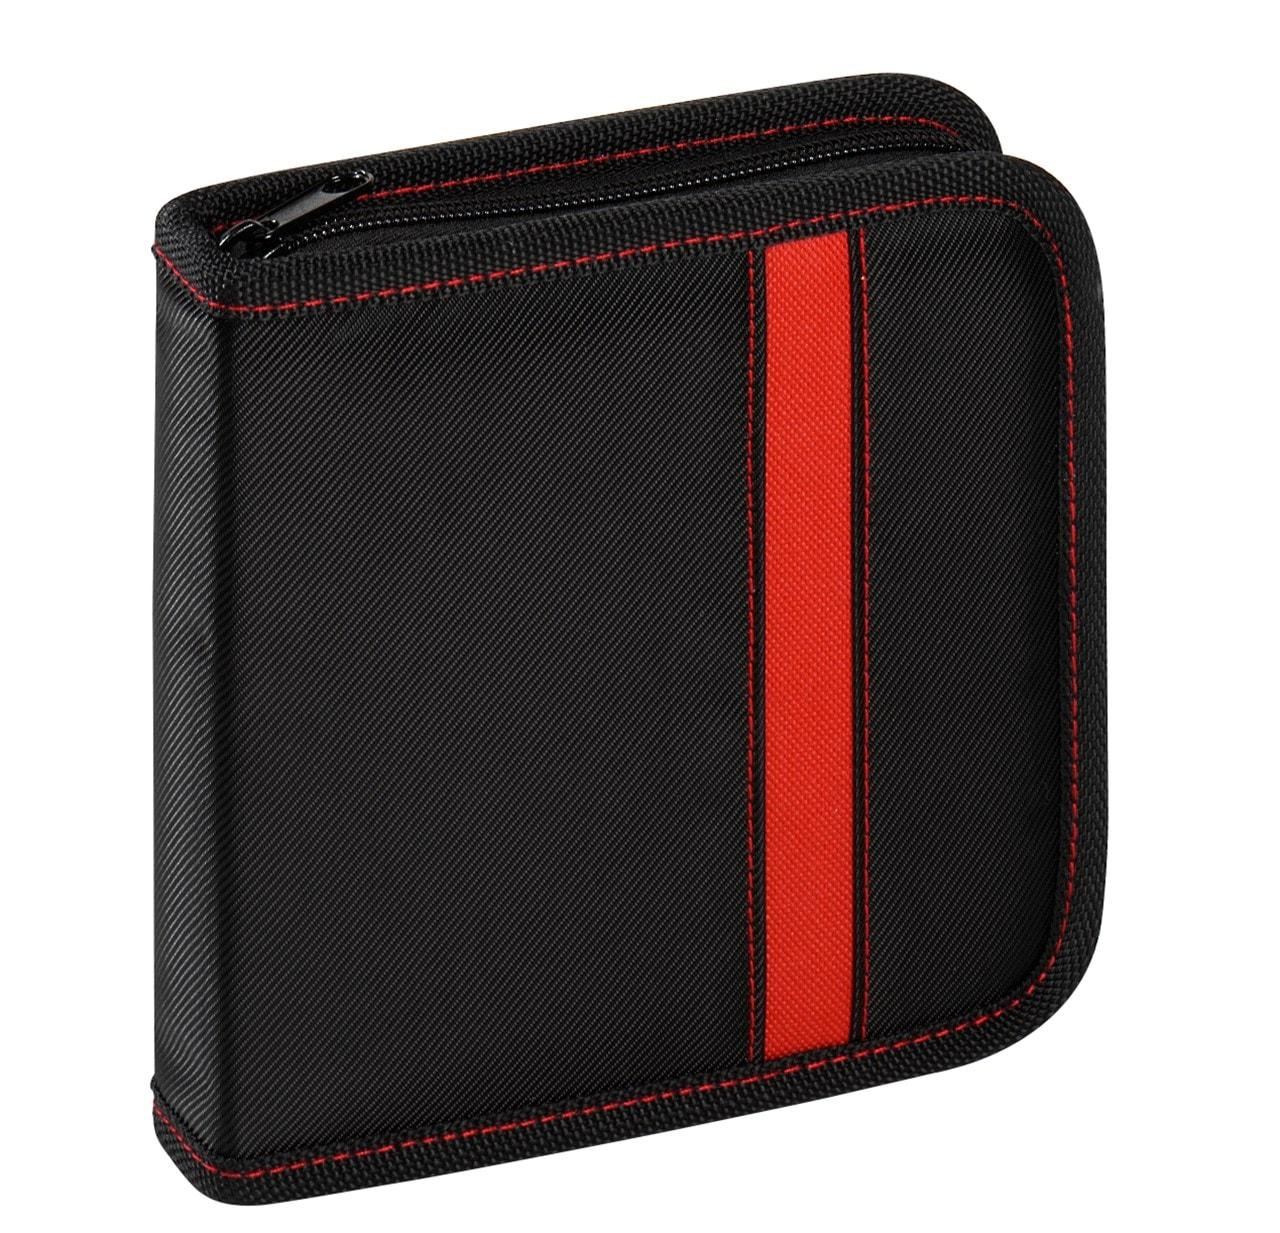 Vivanco 24 CD Wallet Black/Red - 1